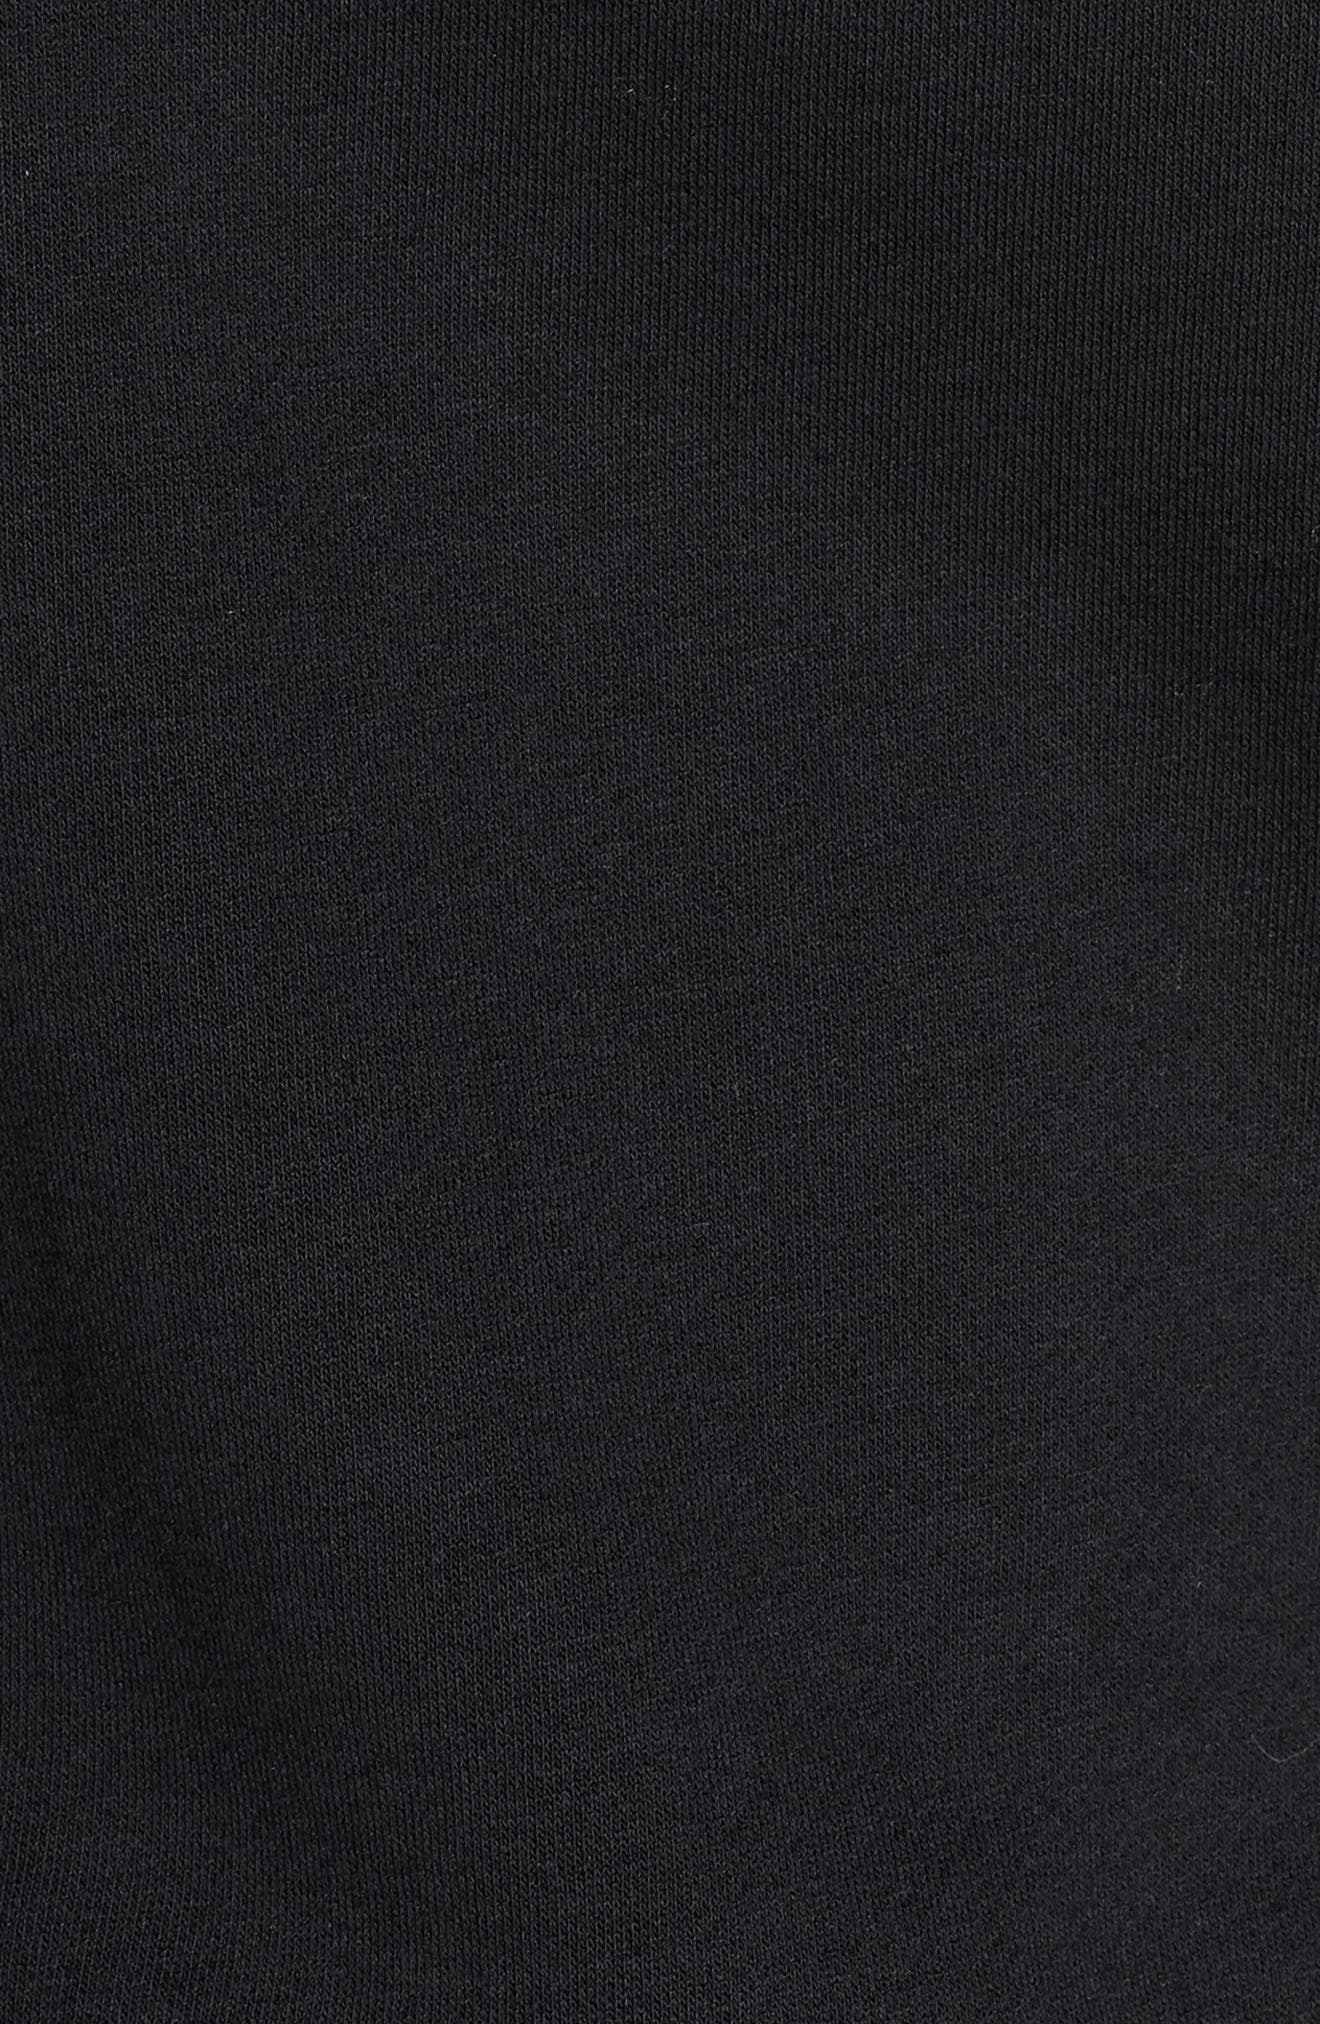 Sportswear Women's Half Zip Fleece Hoodie,                             Alternate thumbnail 6, color,                             BLACK/ BLACK/ ROSE GOLD